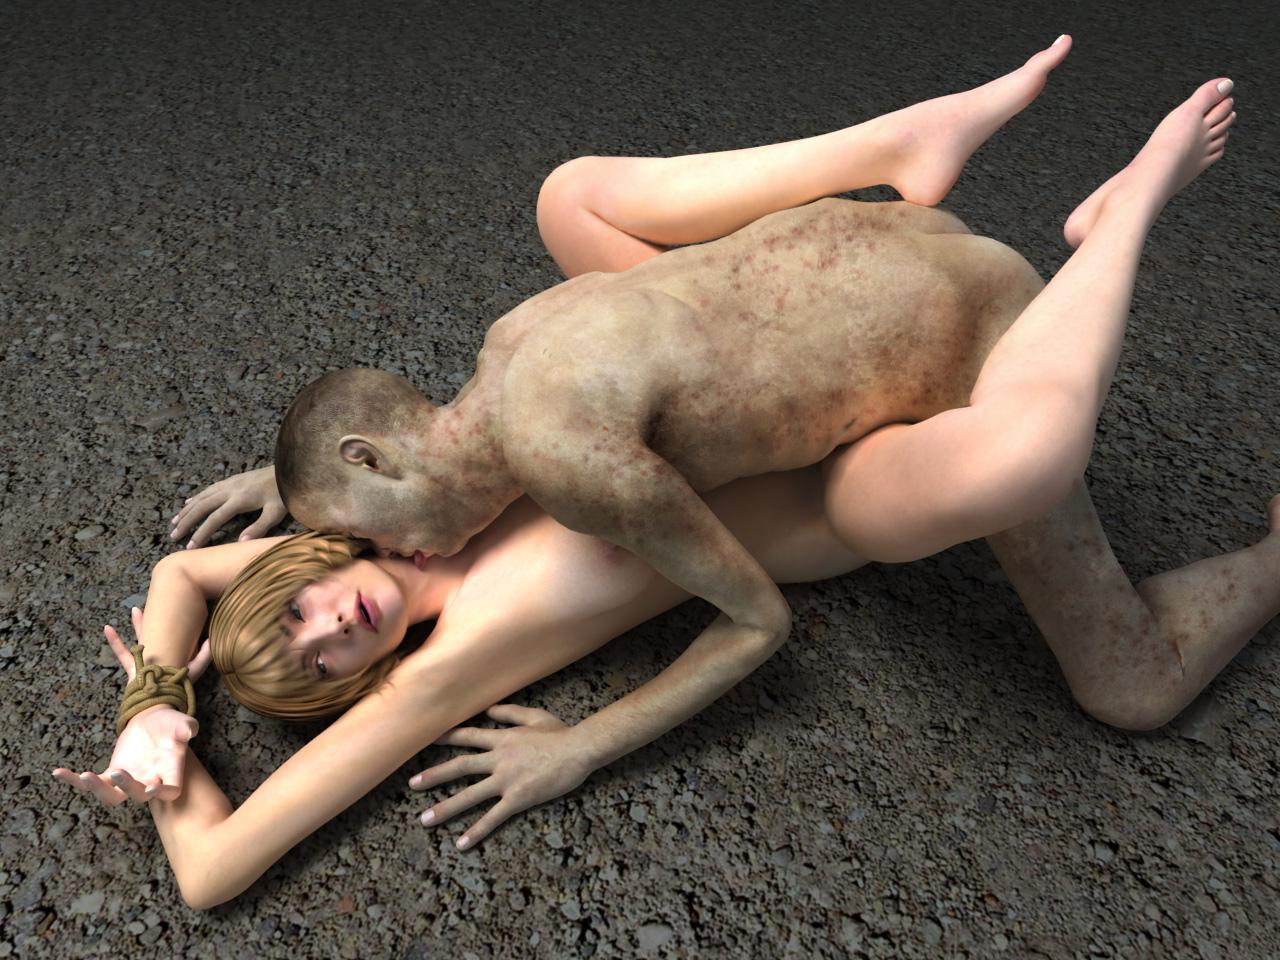 3d human pig porn sex images